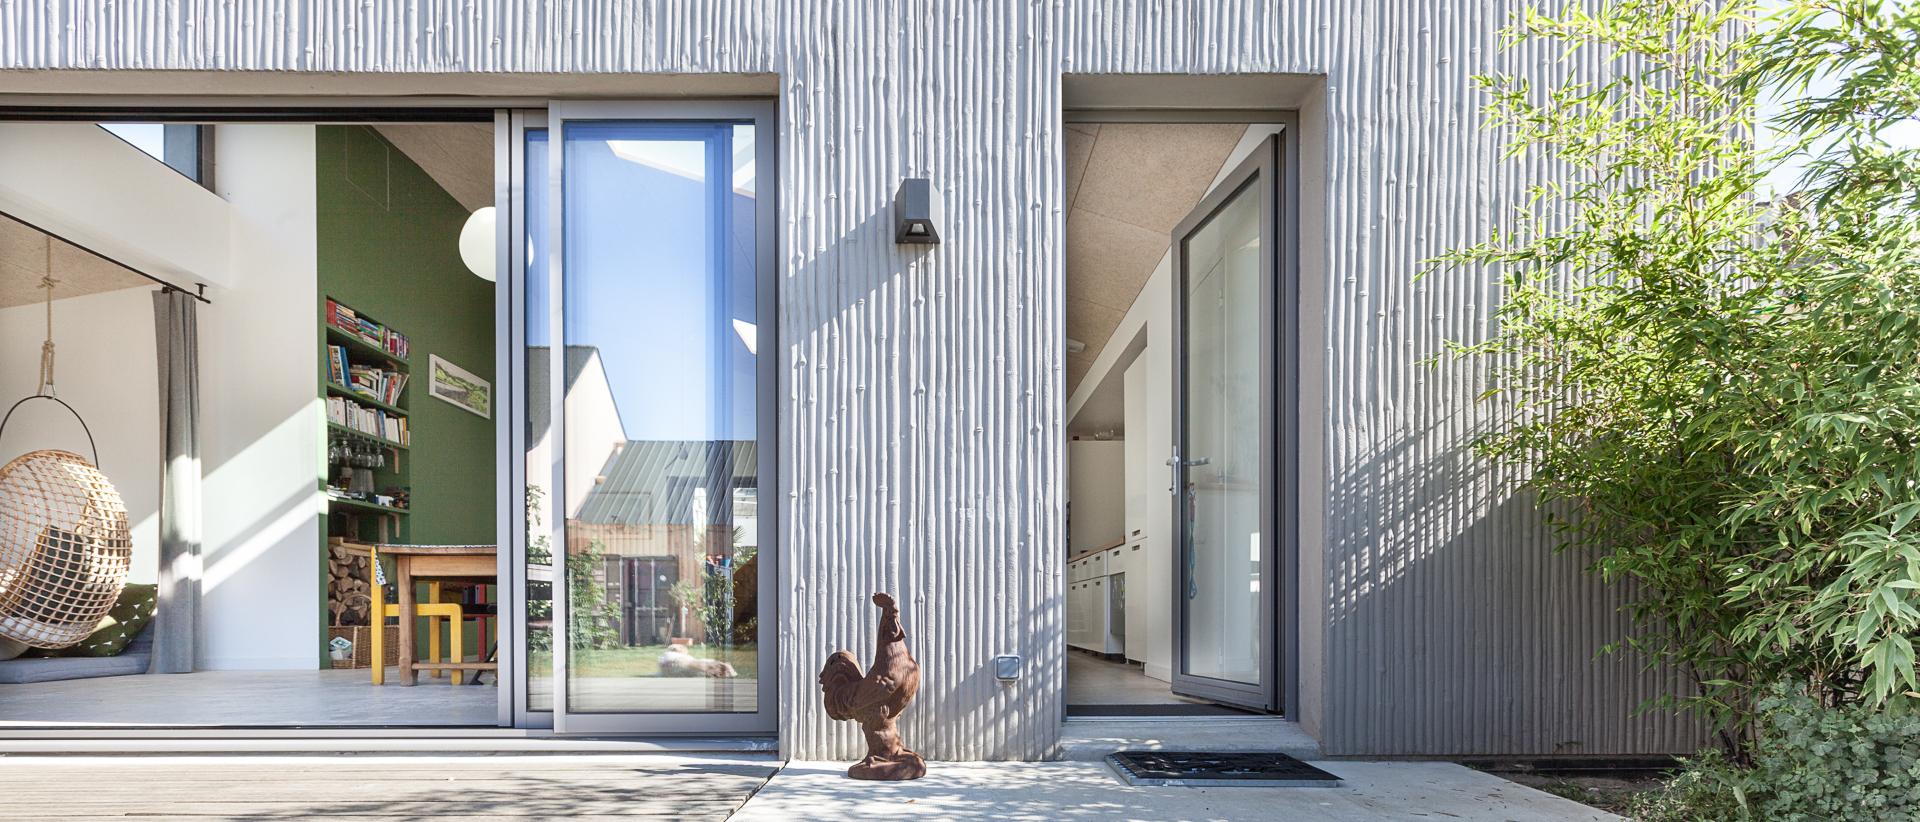 chateau-penhouet1080©bertin-bichet-architectes-8.jpg